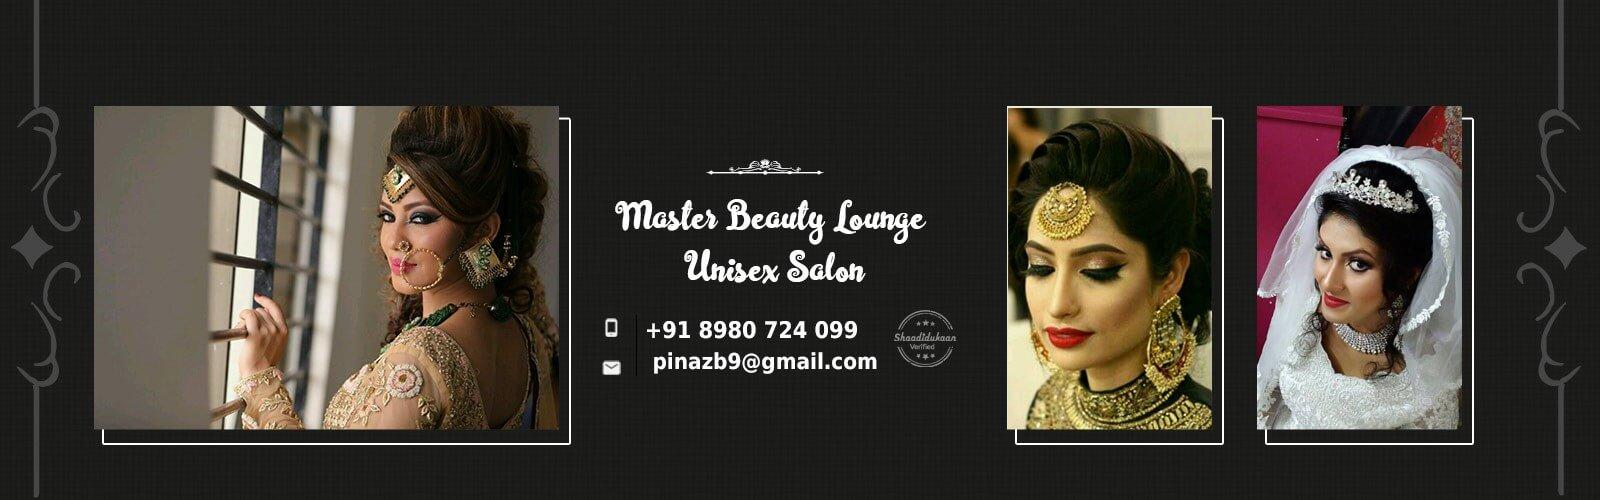 Master Beauty Loung Unisex Saloon